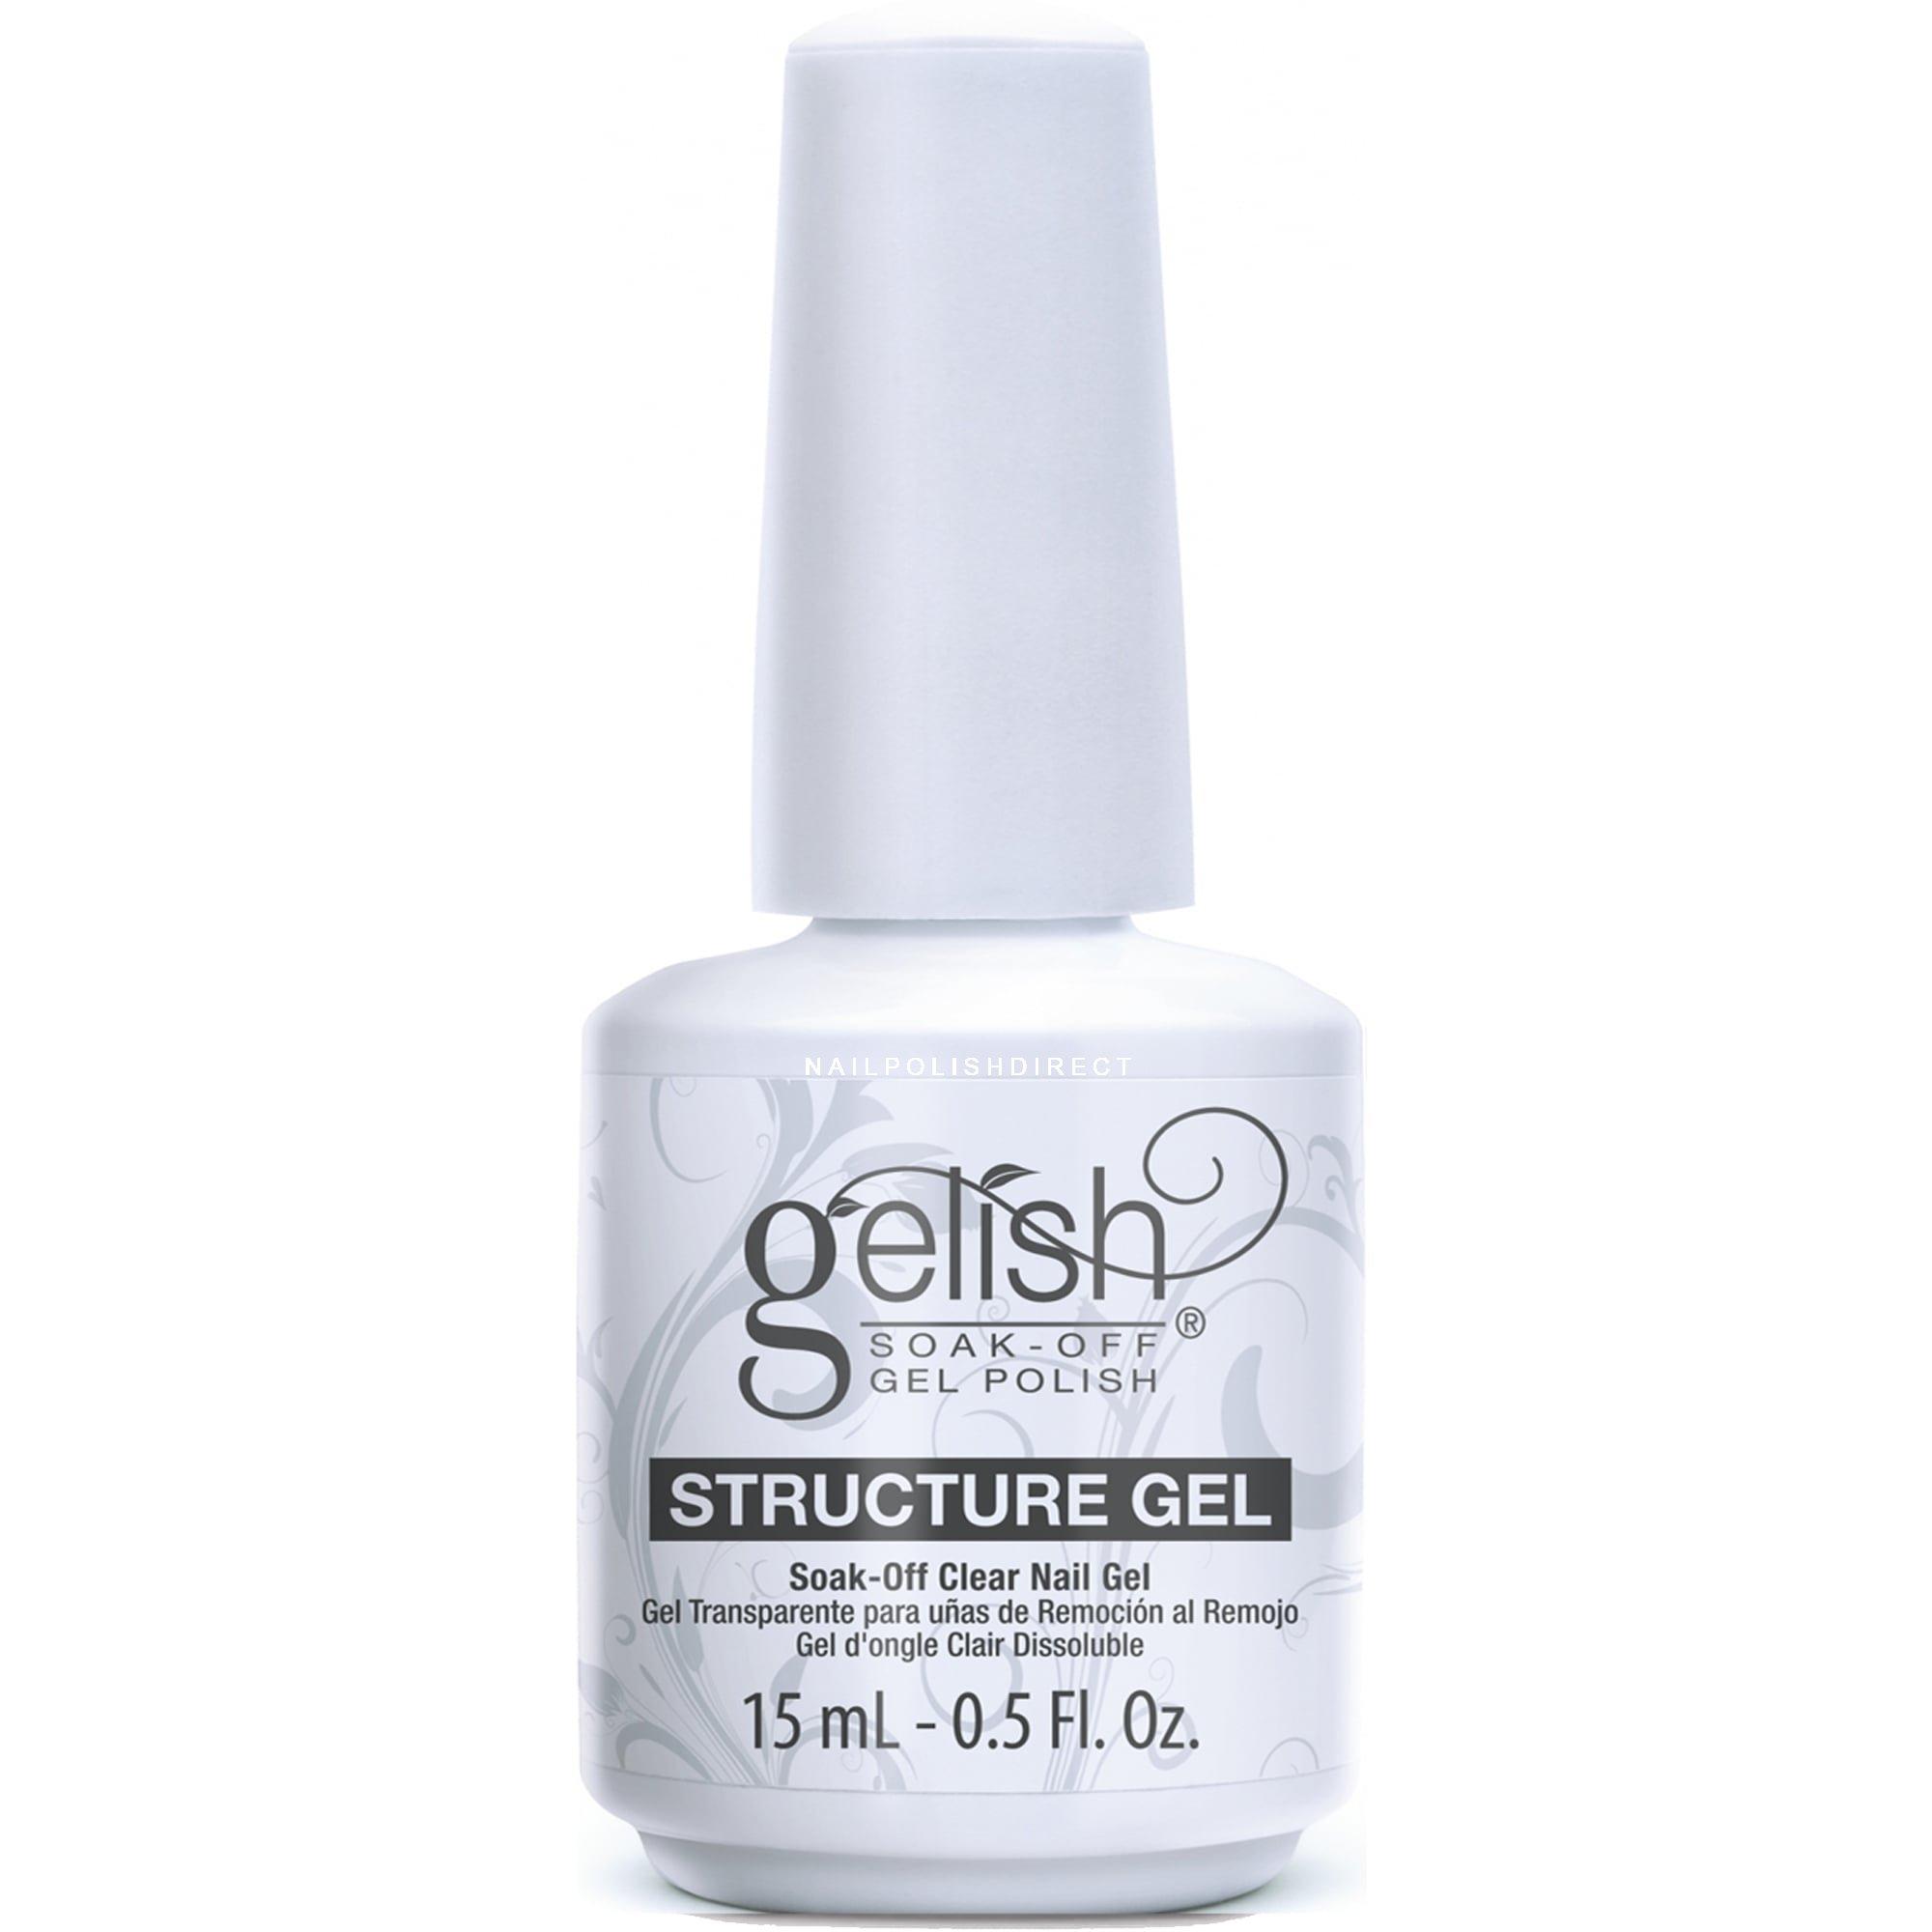 Structure Gel - Brush On Gel 15ml